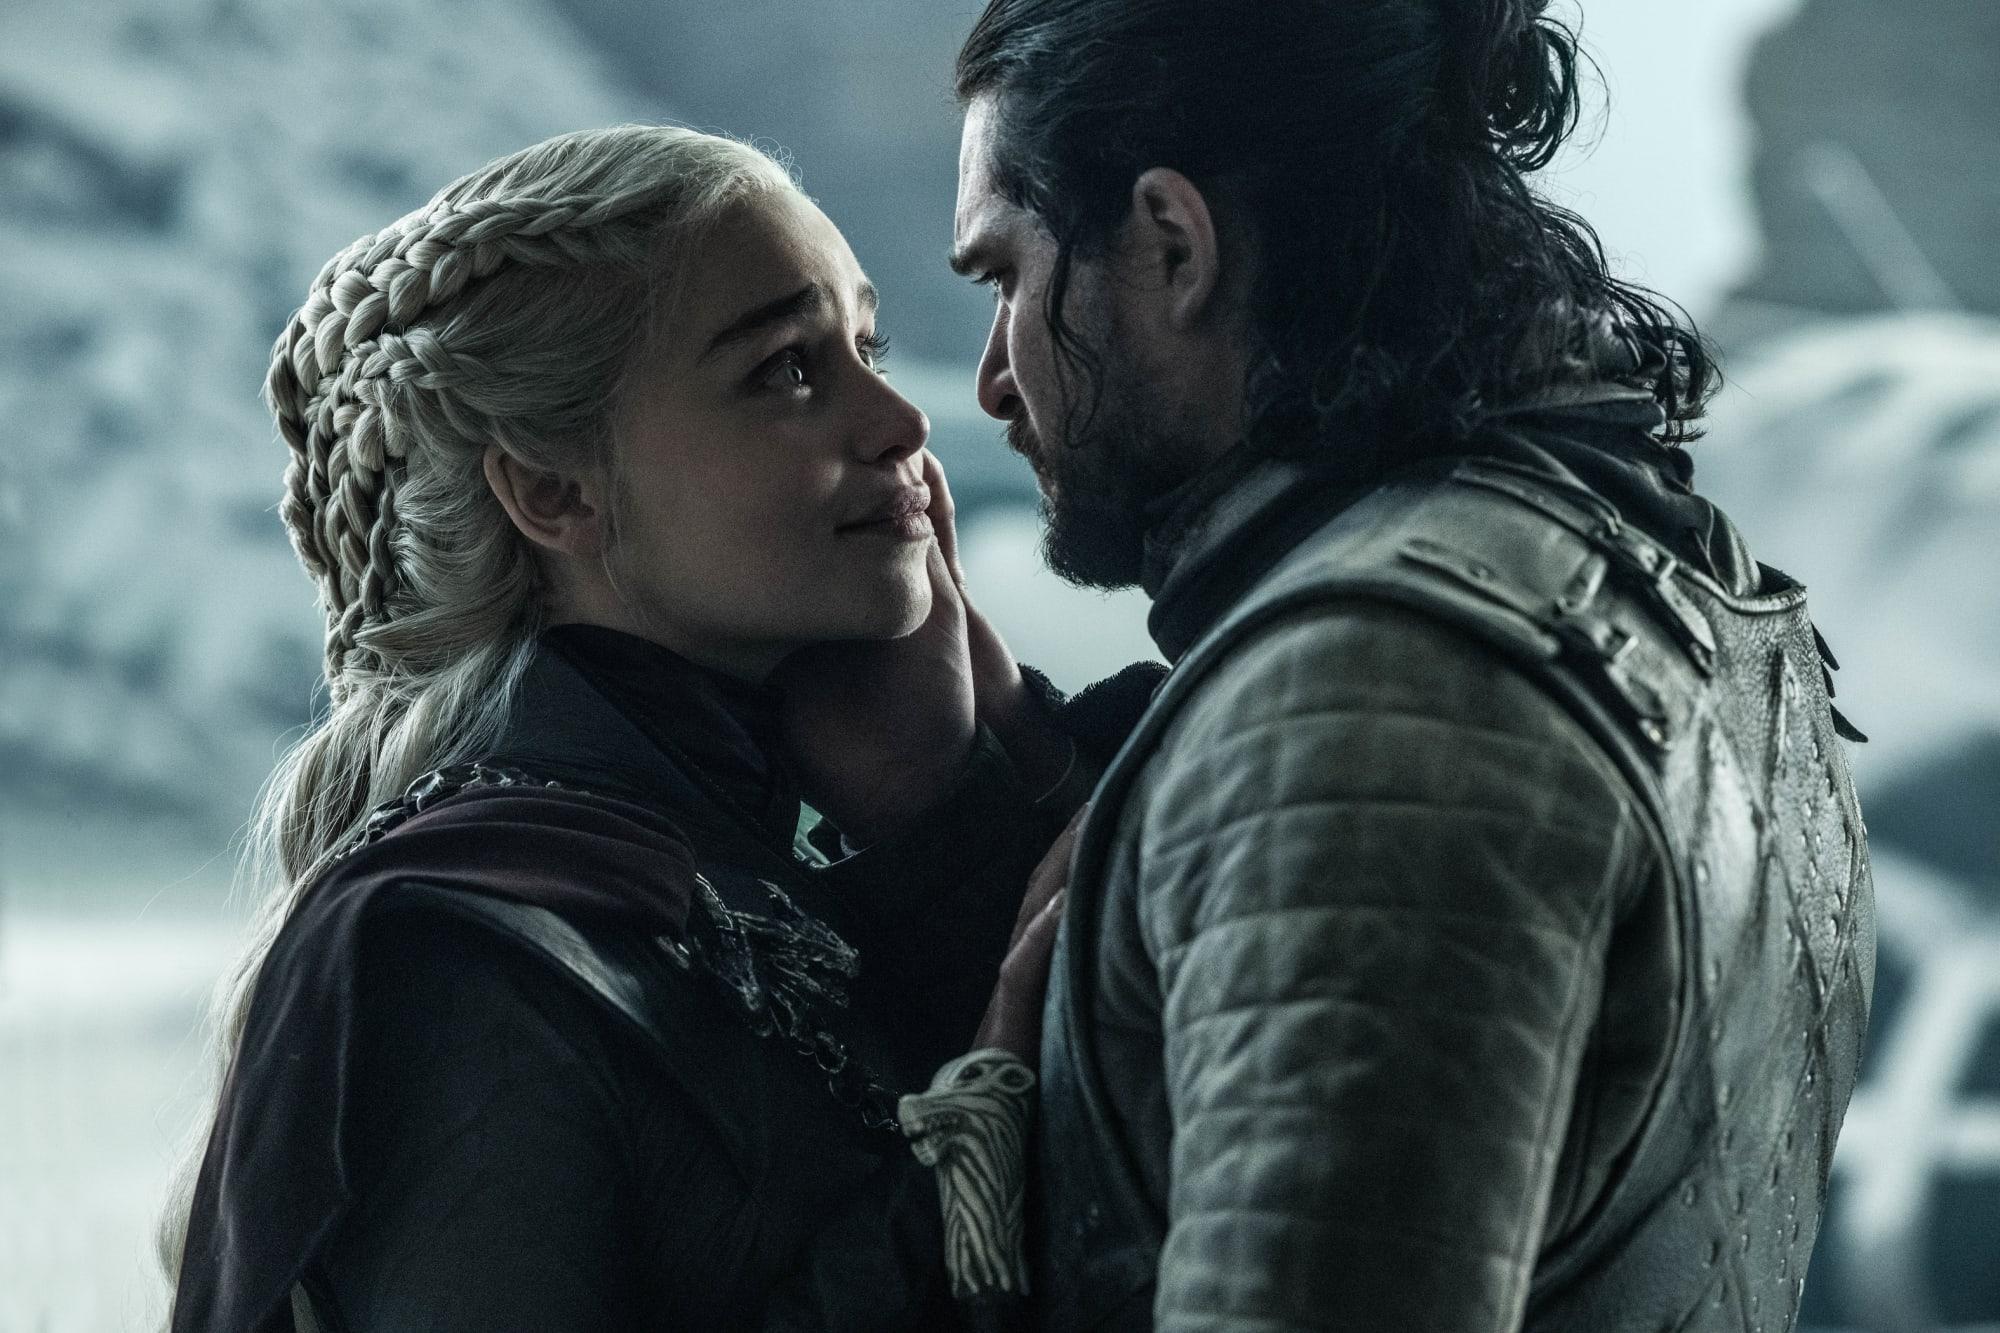 Here's what Jon Snow and Daenerys Targaryen's daughter would look like